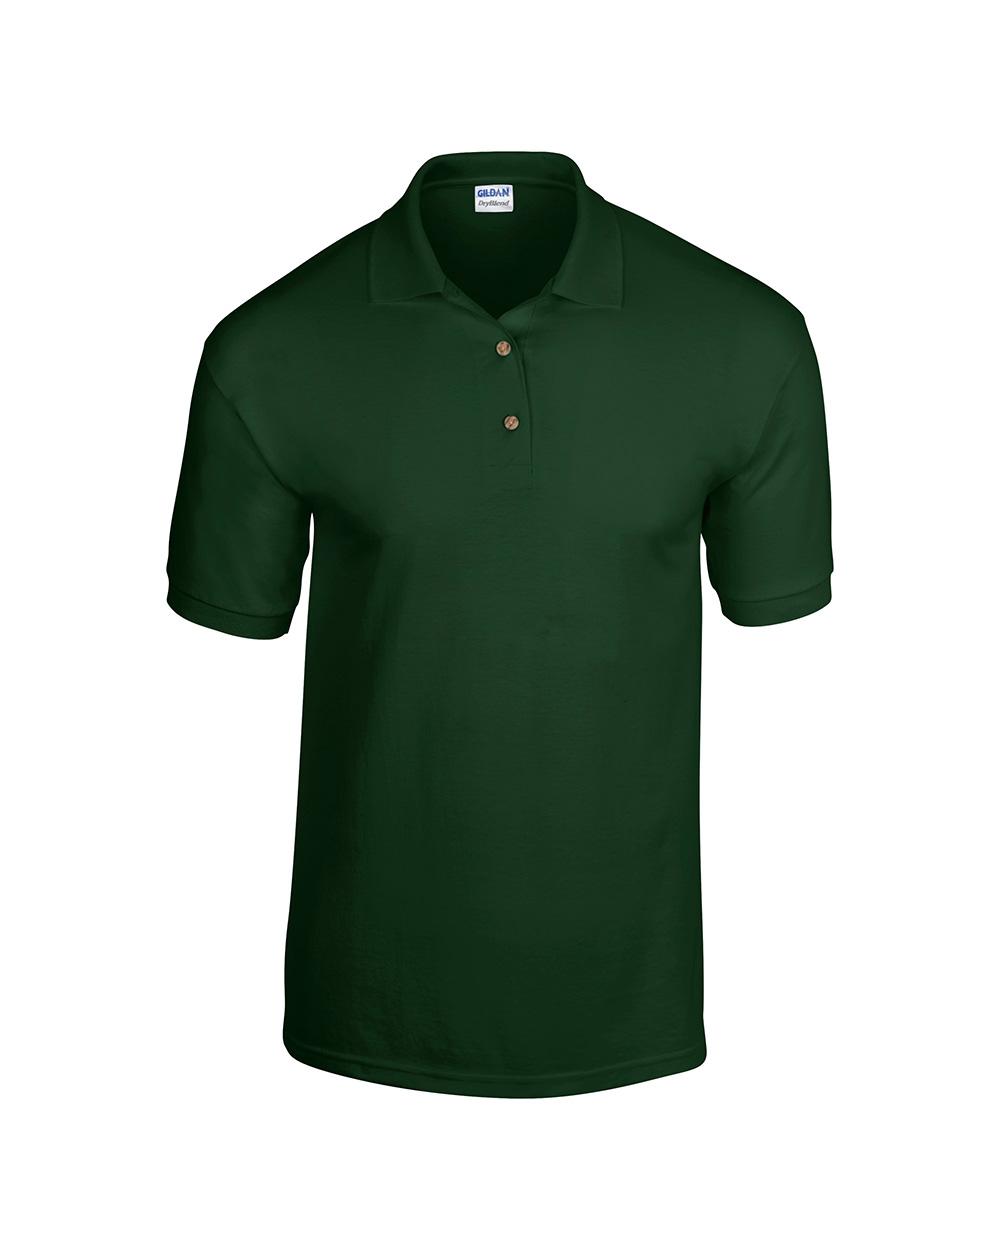 Gildan Golf Shirt Express Impressions Inc